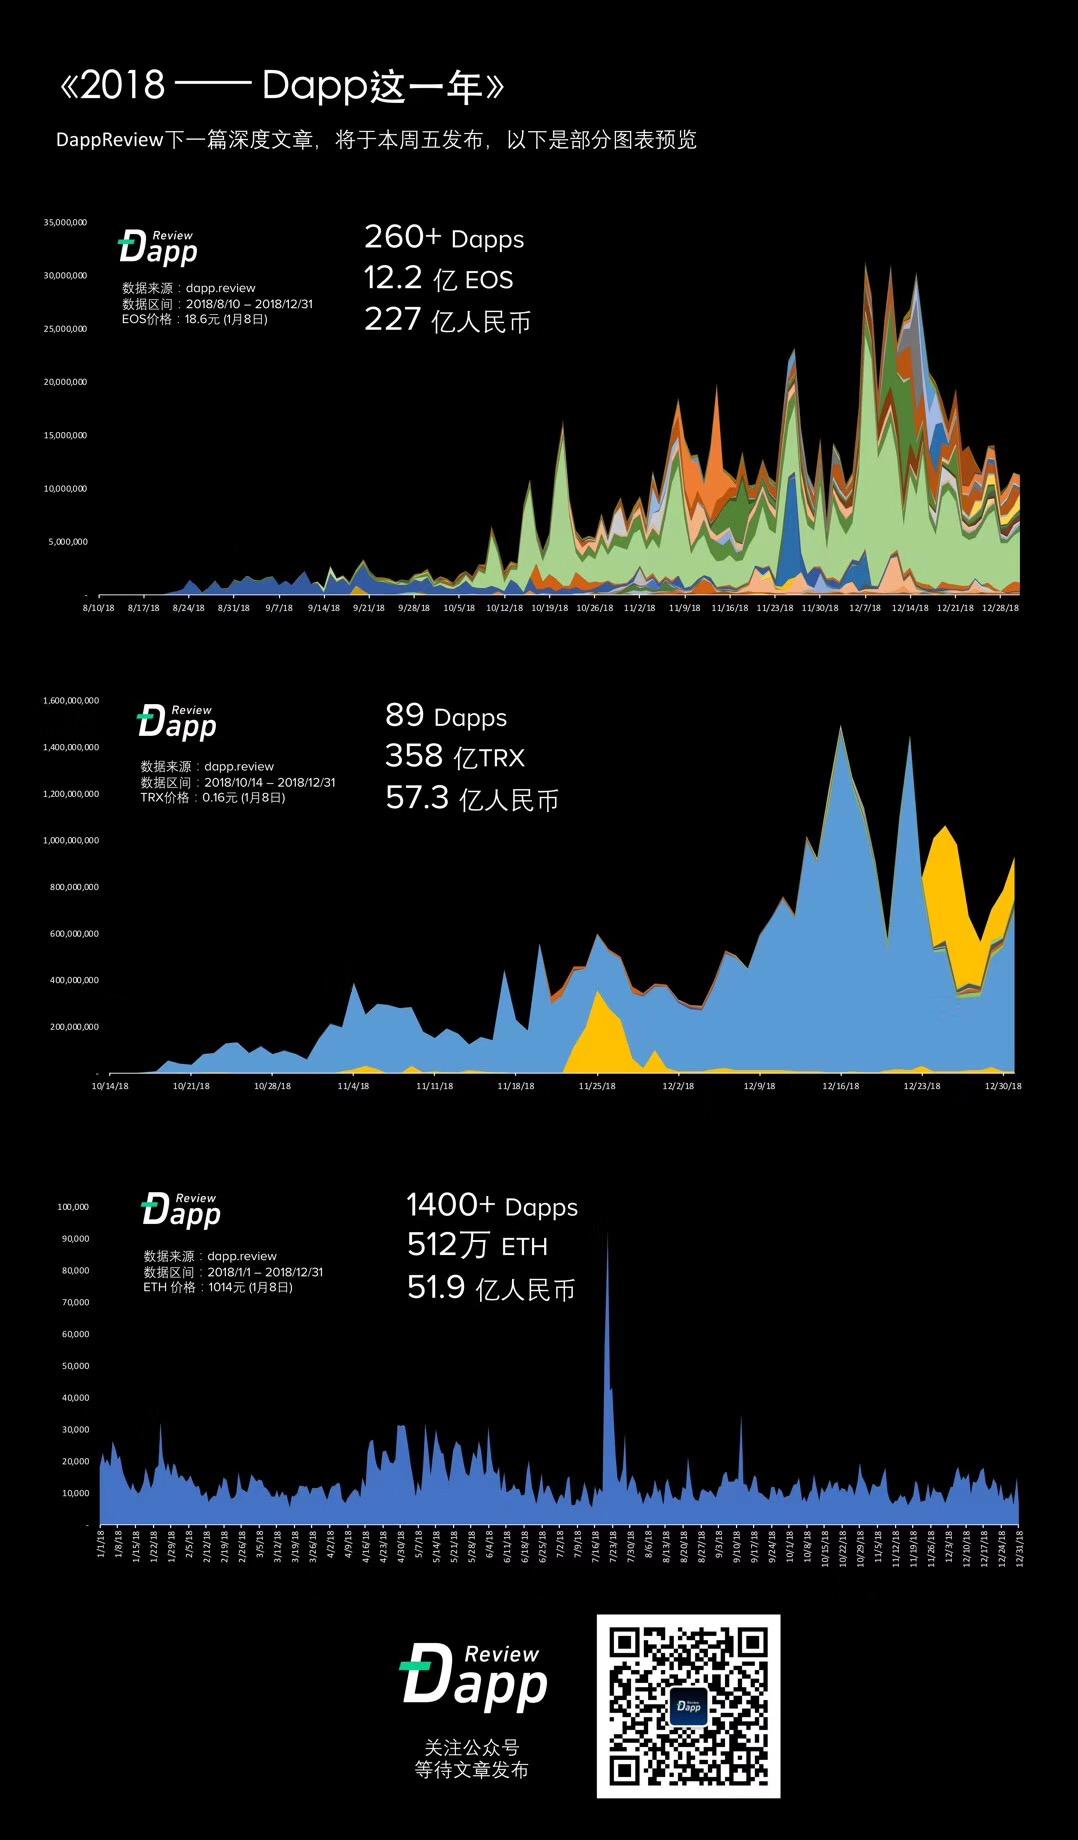 DApp review 2018 年统计数据